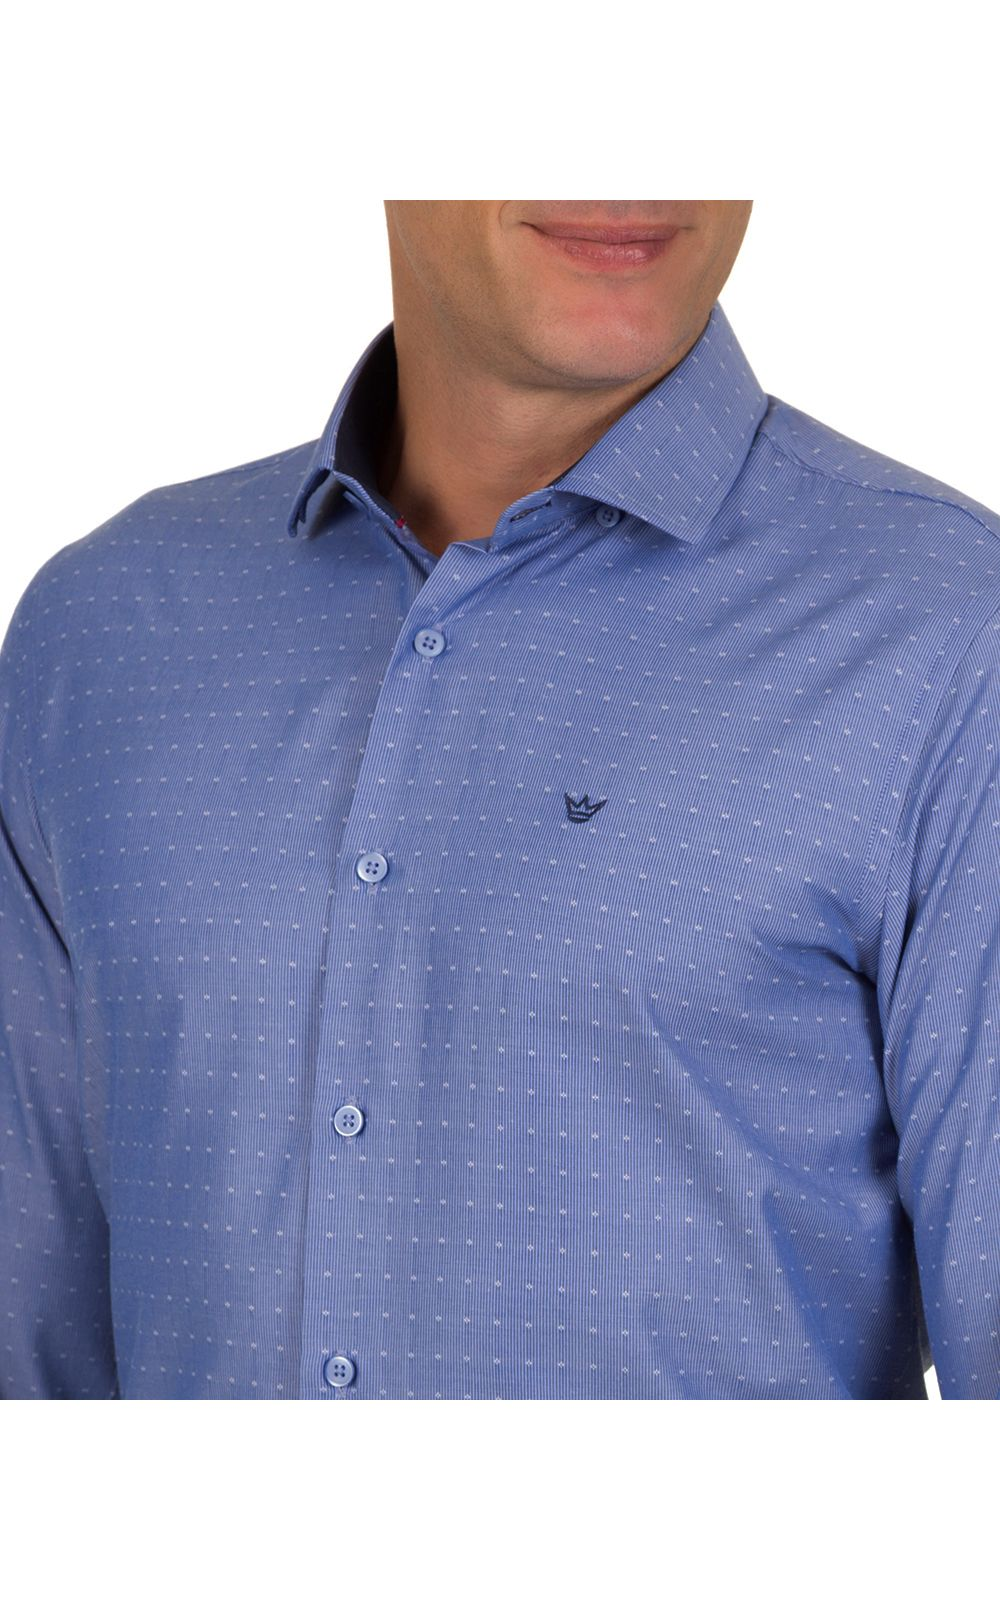 Foto 3 - Camisa Social Masculina Azul Detalhada